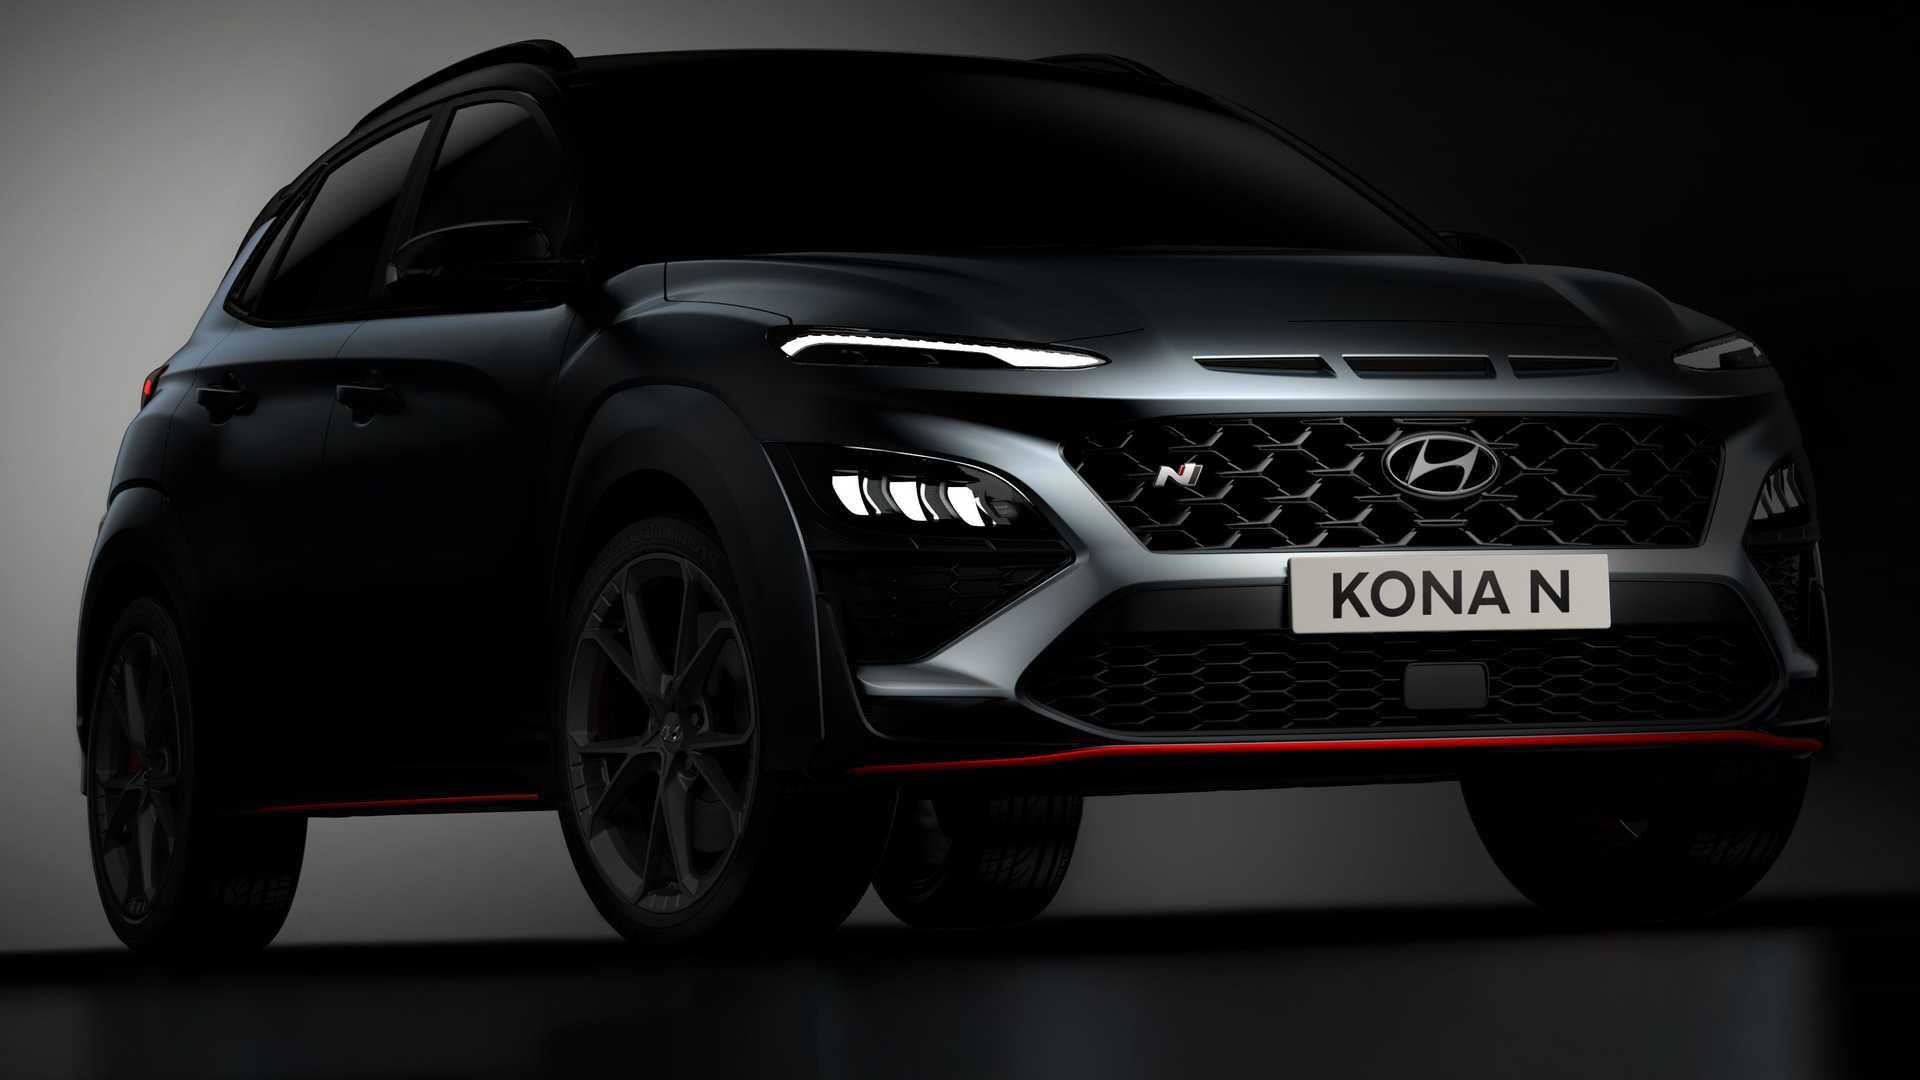 La Hyundai Kona N si mostra sportiva e senza veli